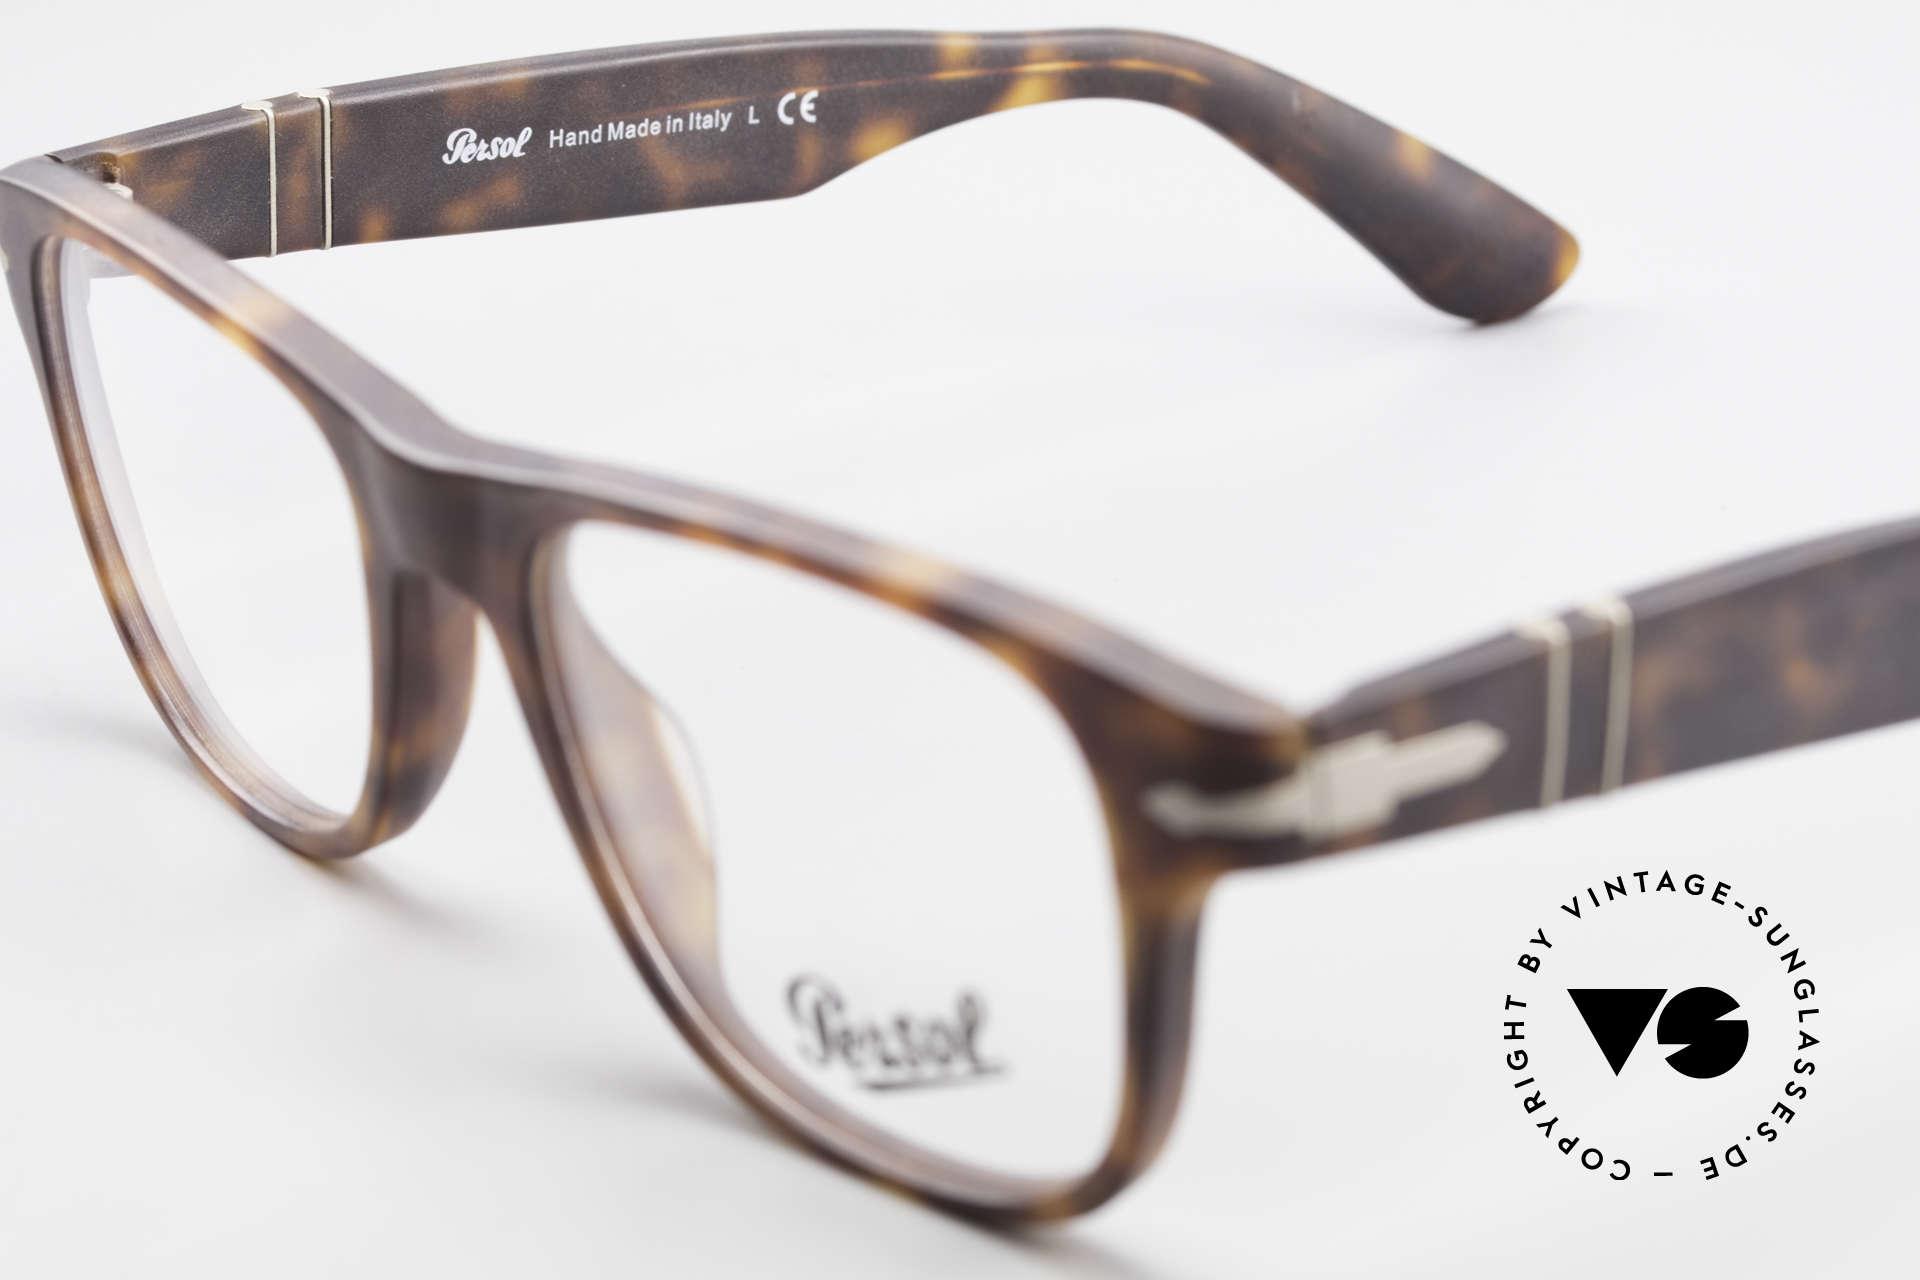 Persol 3051 Timeless Designer Eyeglasses, Size: medium, Made for Men and Women